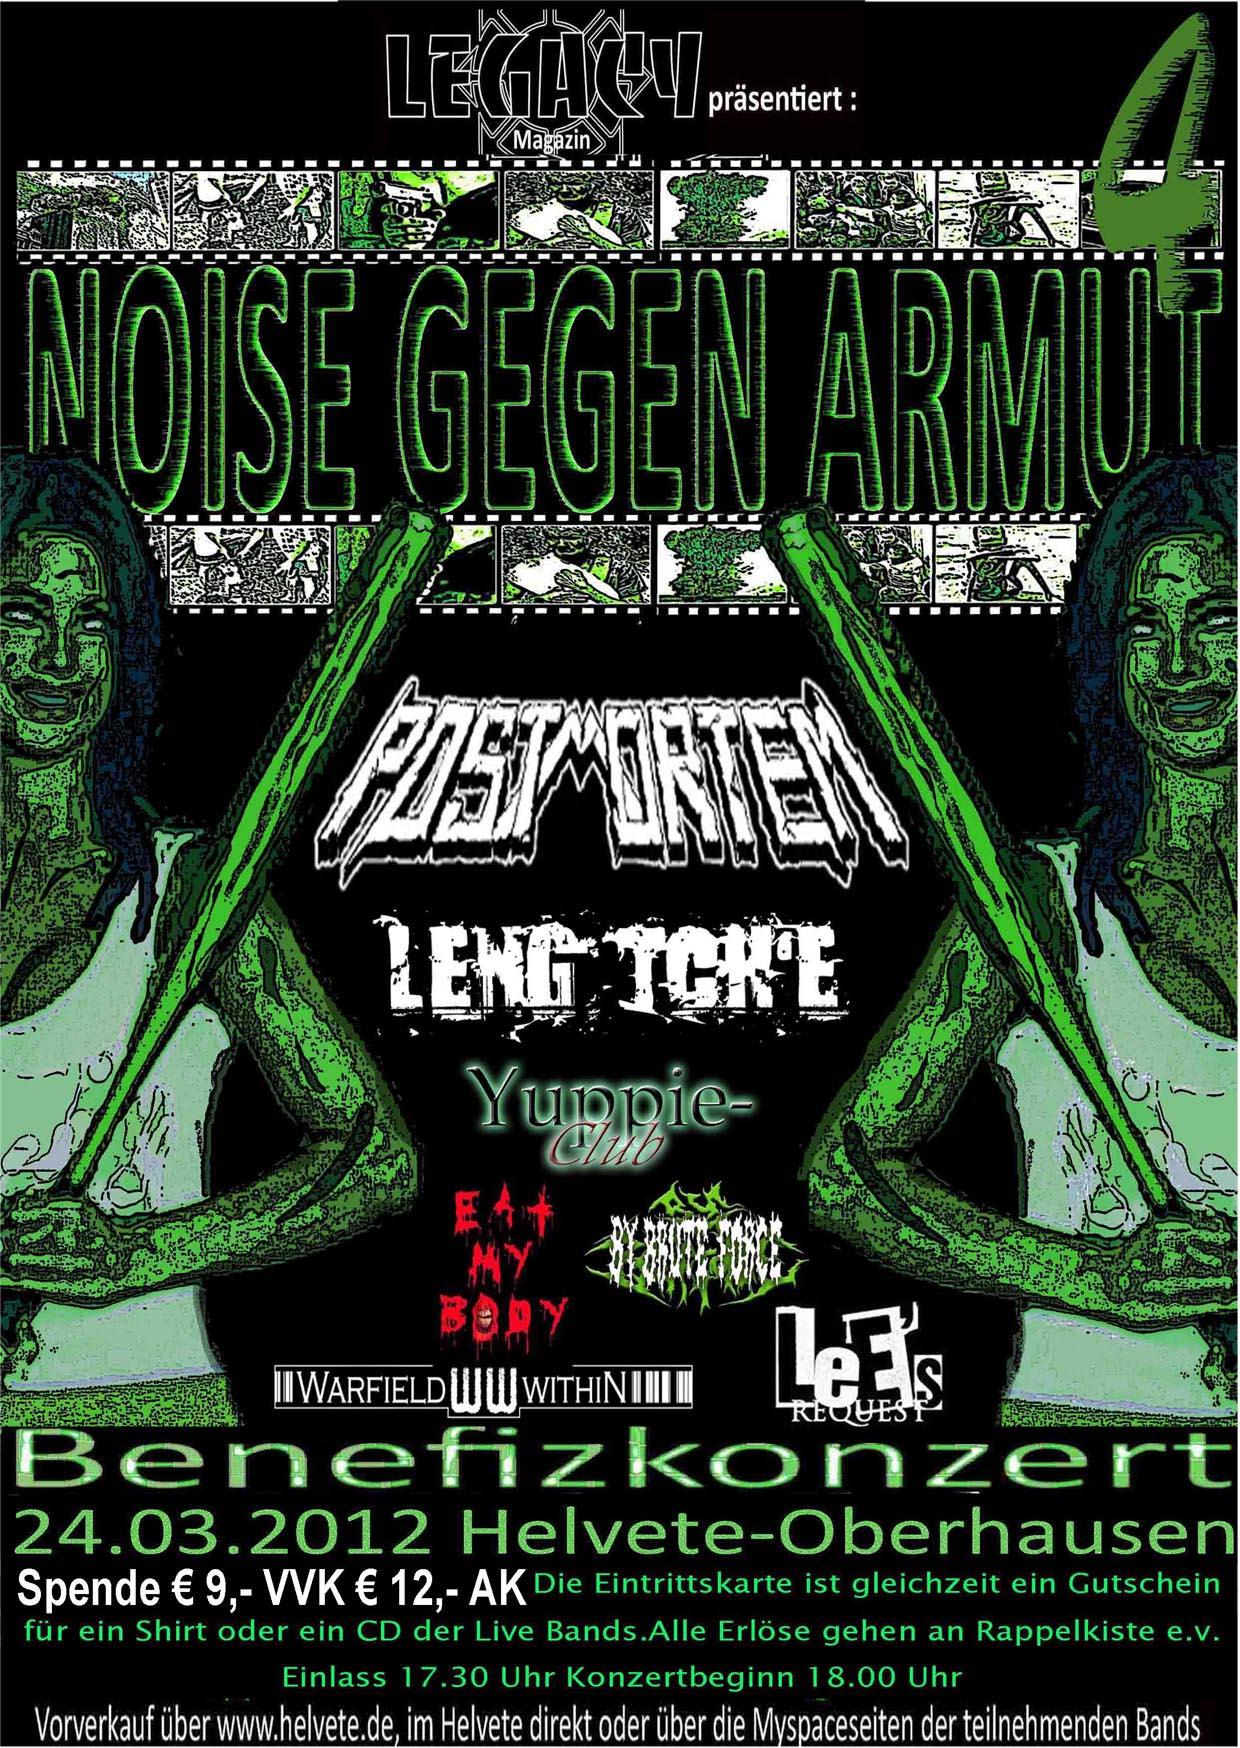 Official Flyer: Noise gegen Armut 4